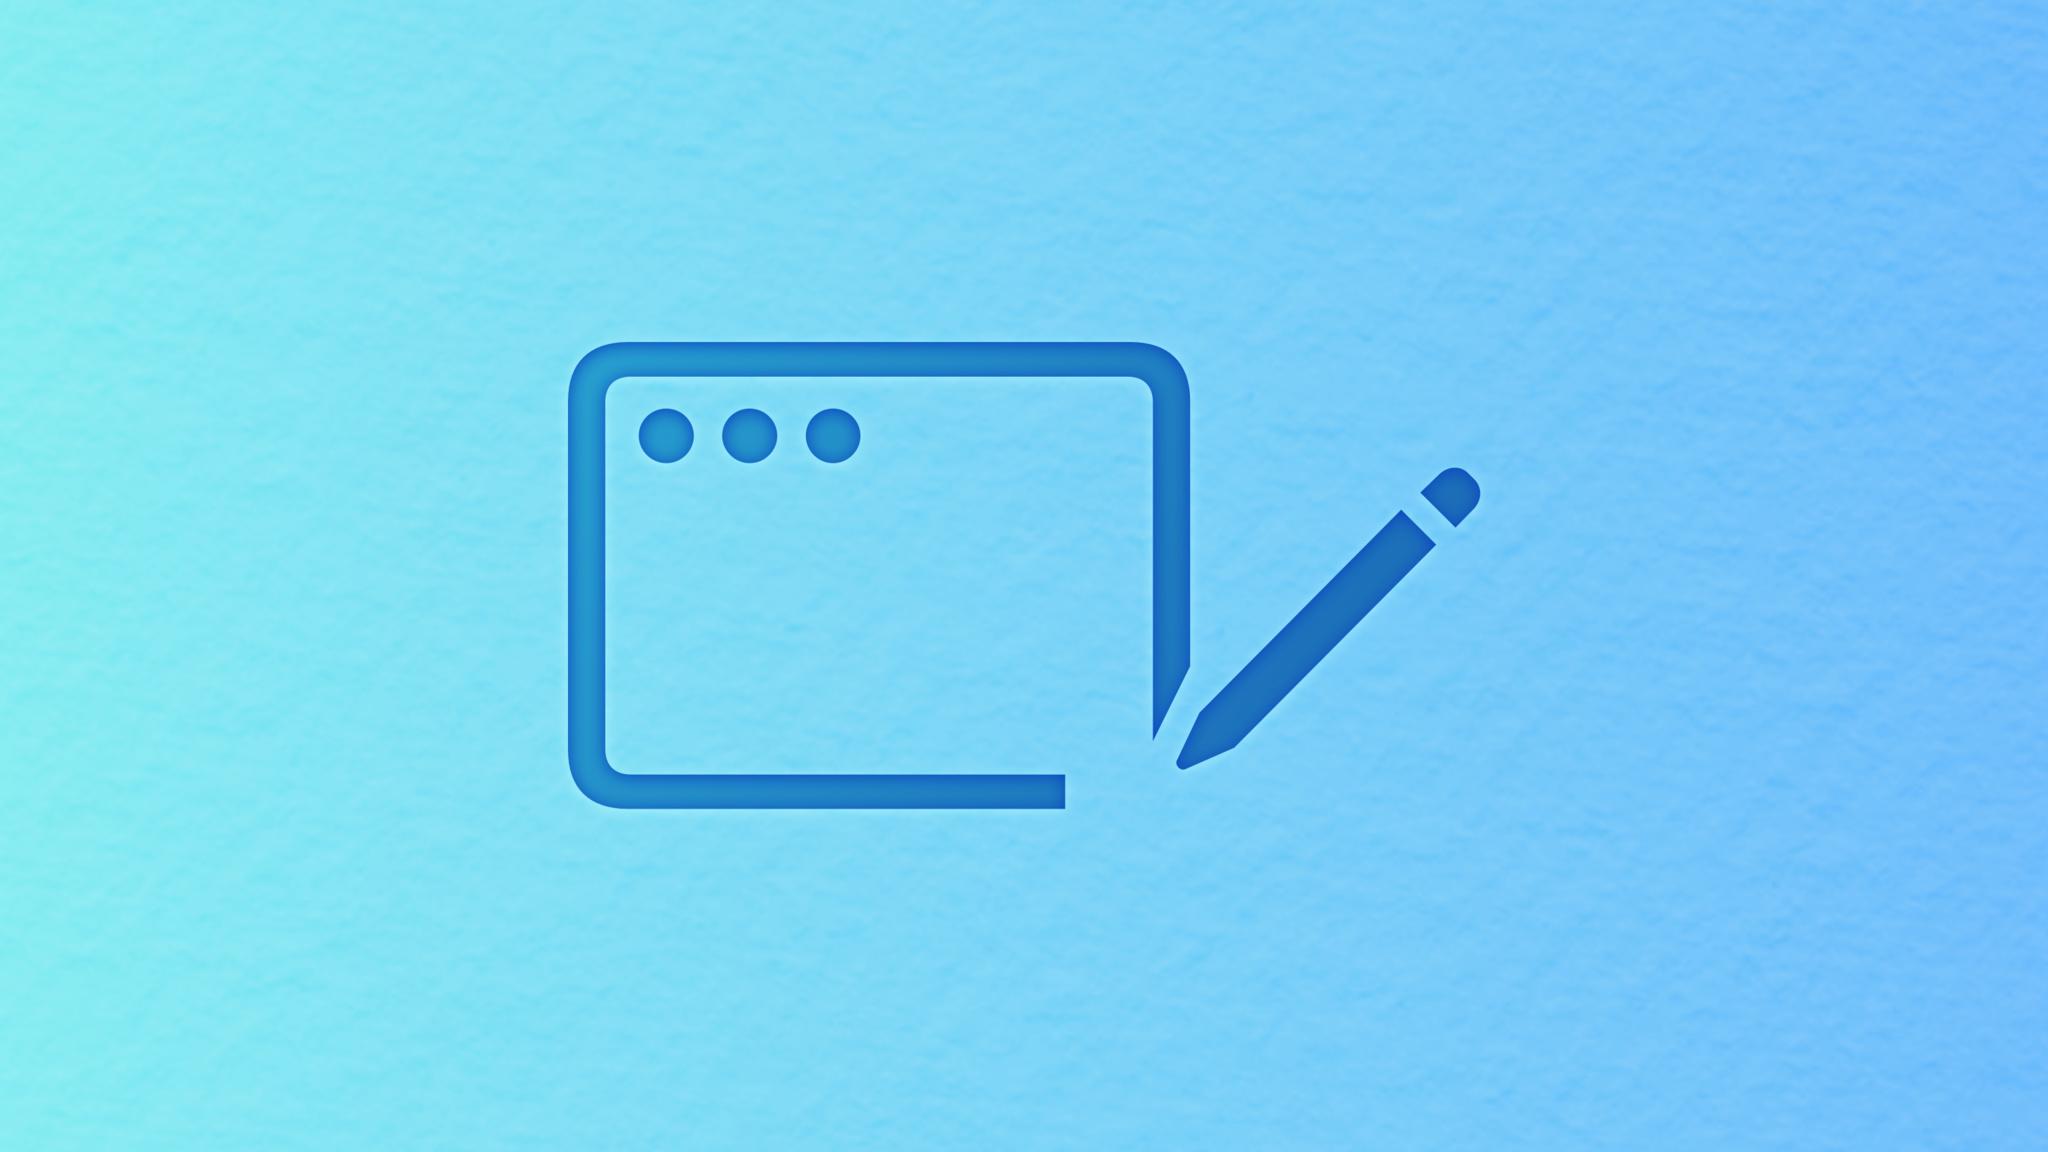 Pencil drawing a MacOS window